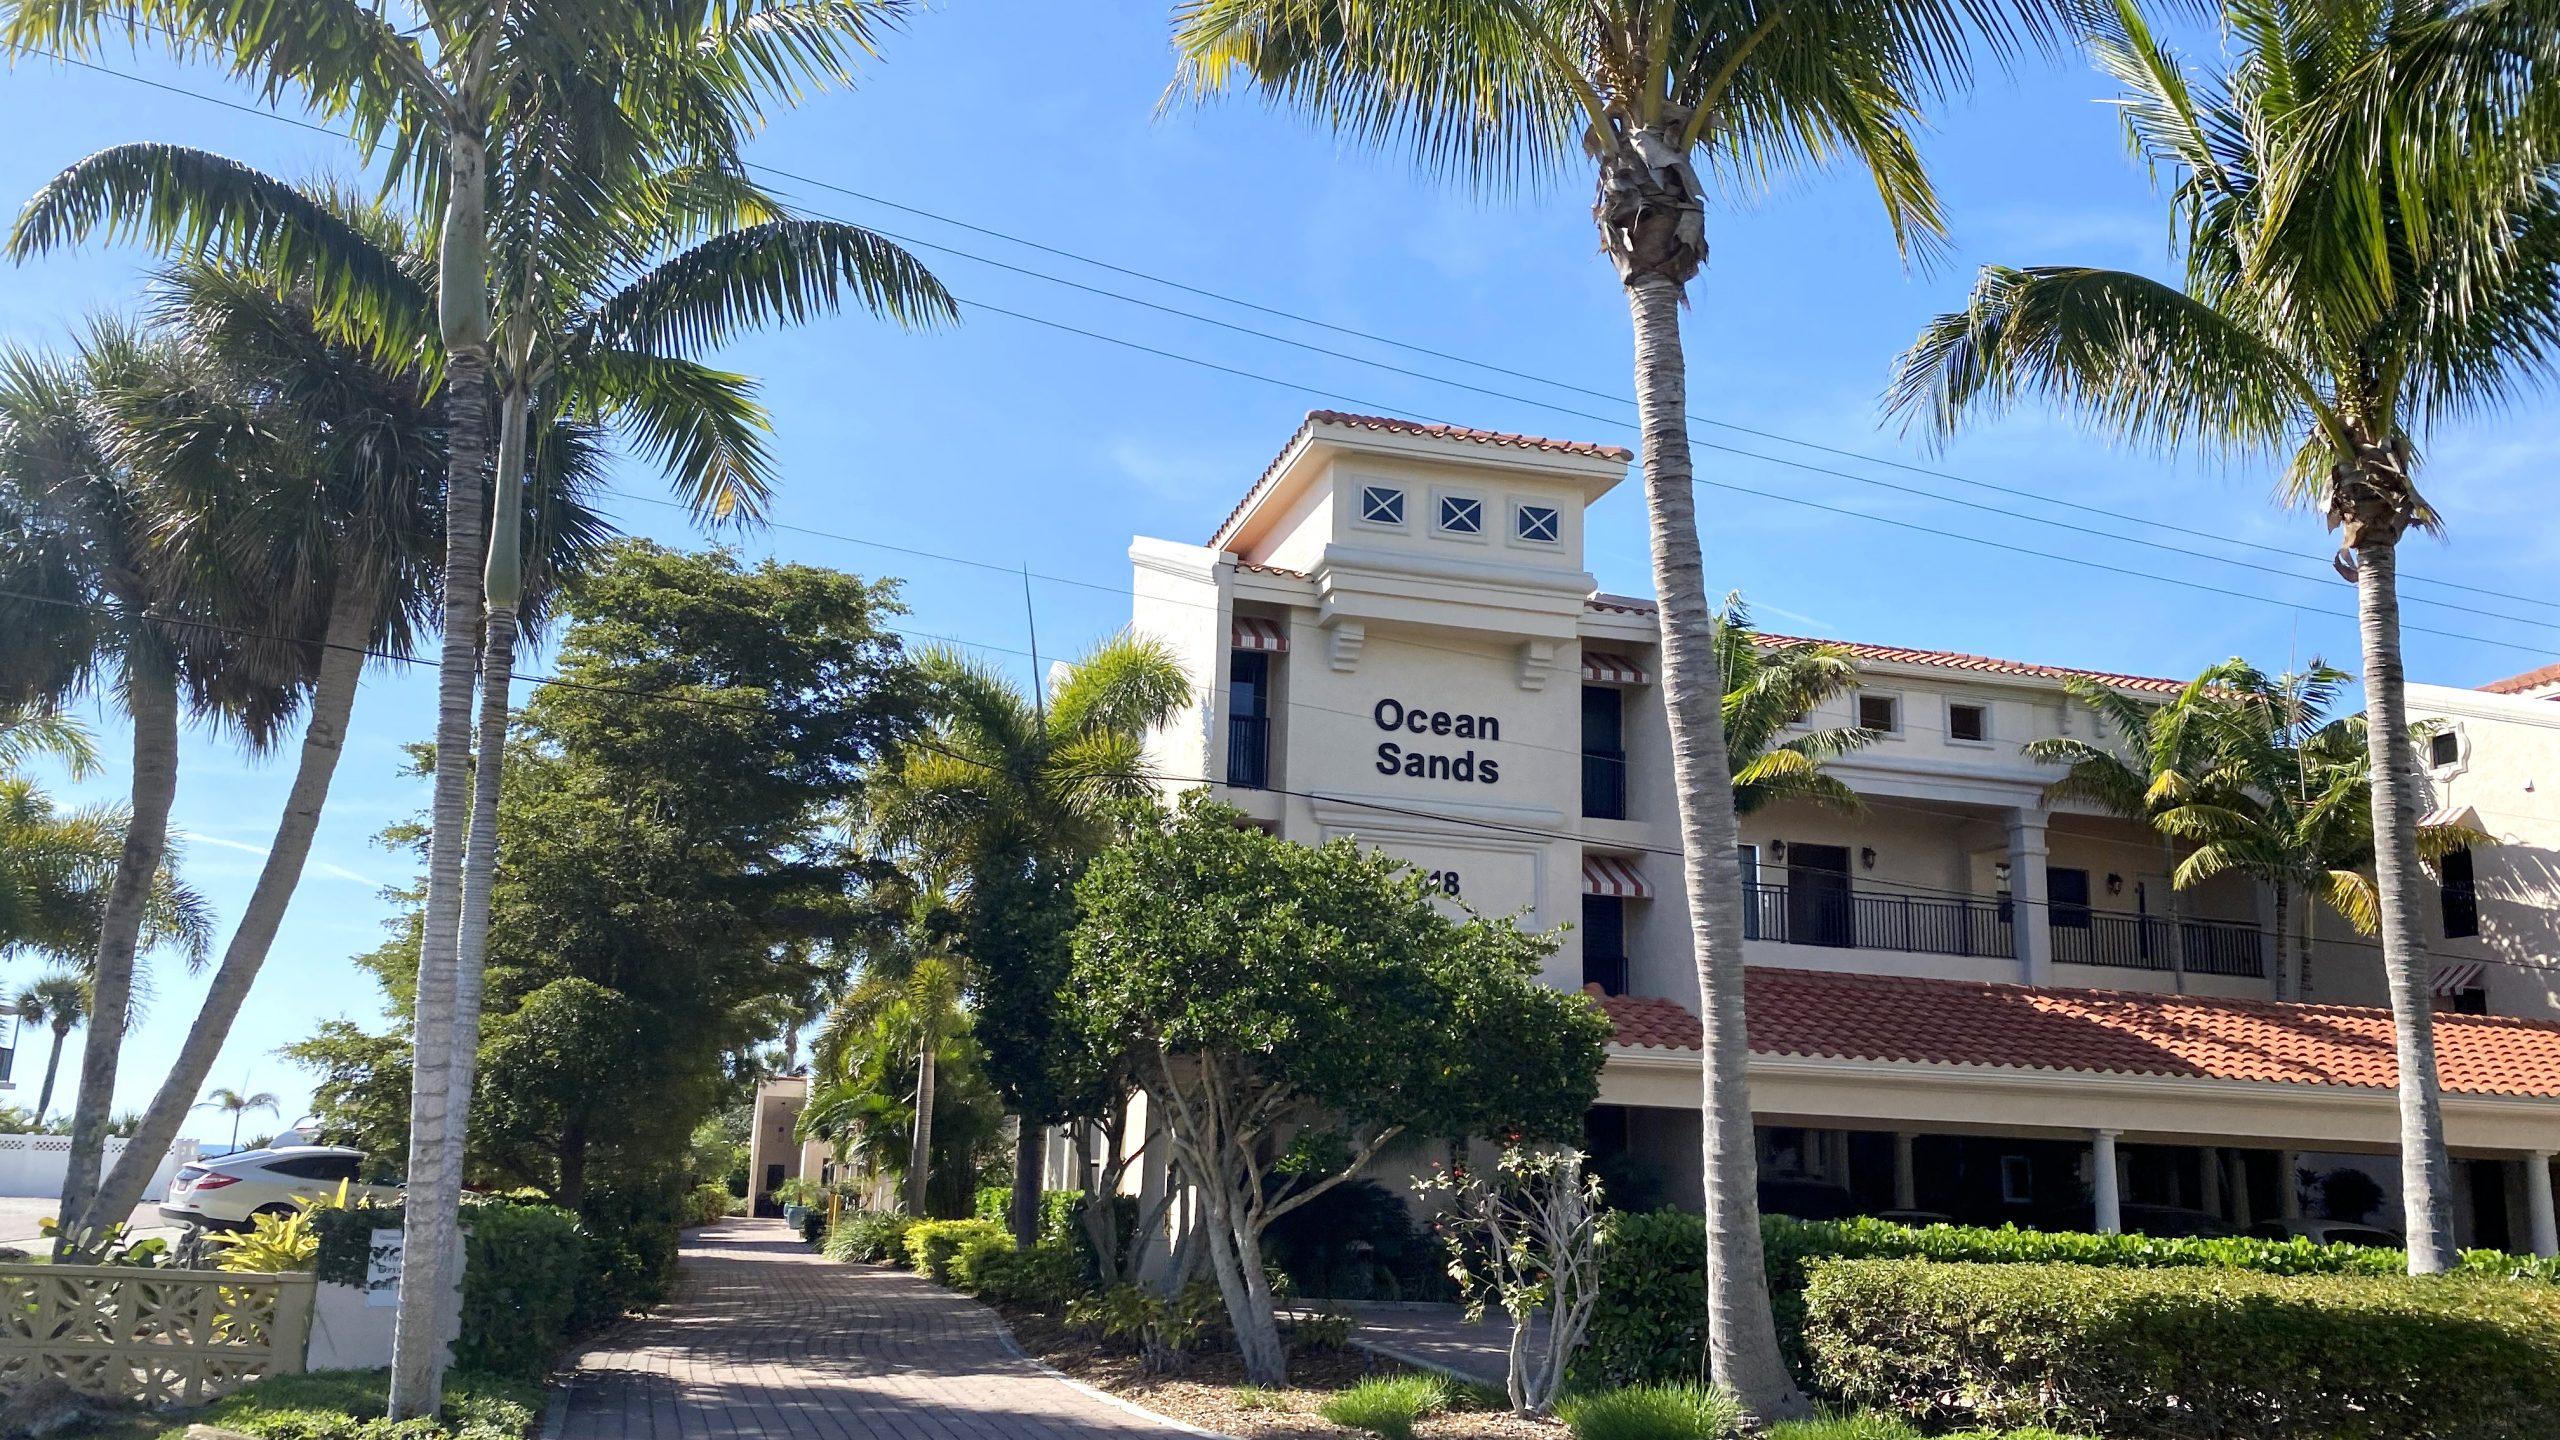 Ocean sands pet friendly condo in Venice, Florida for sale.